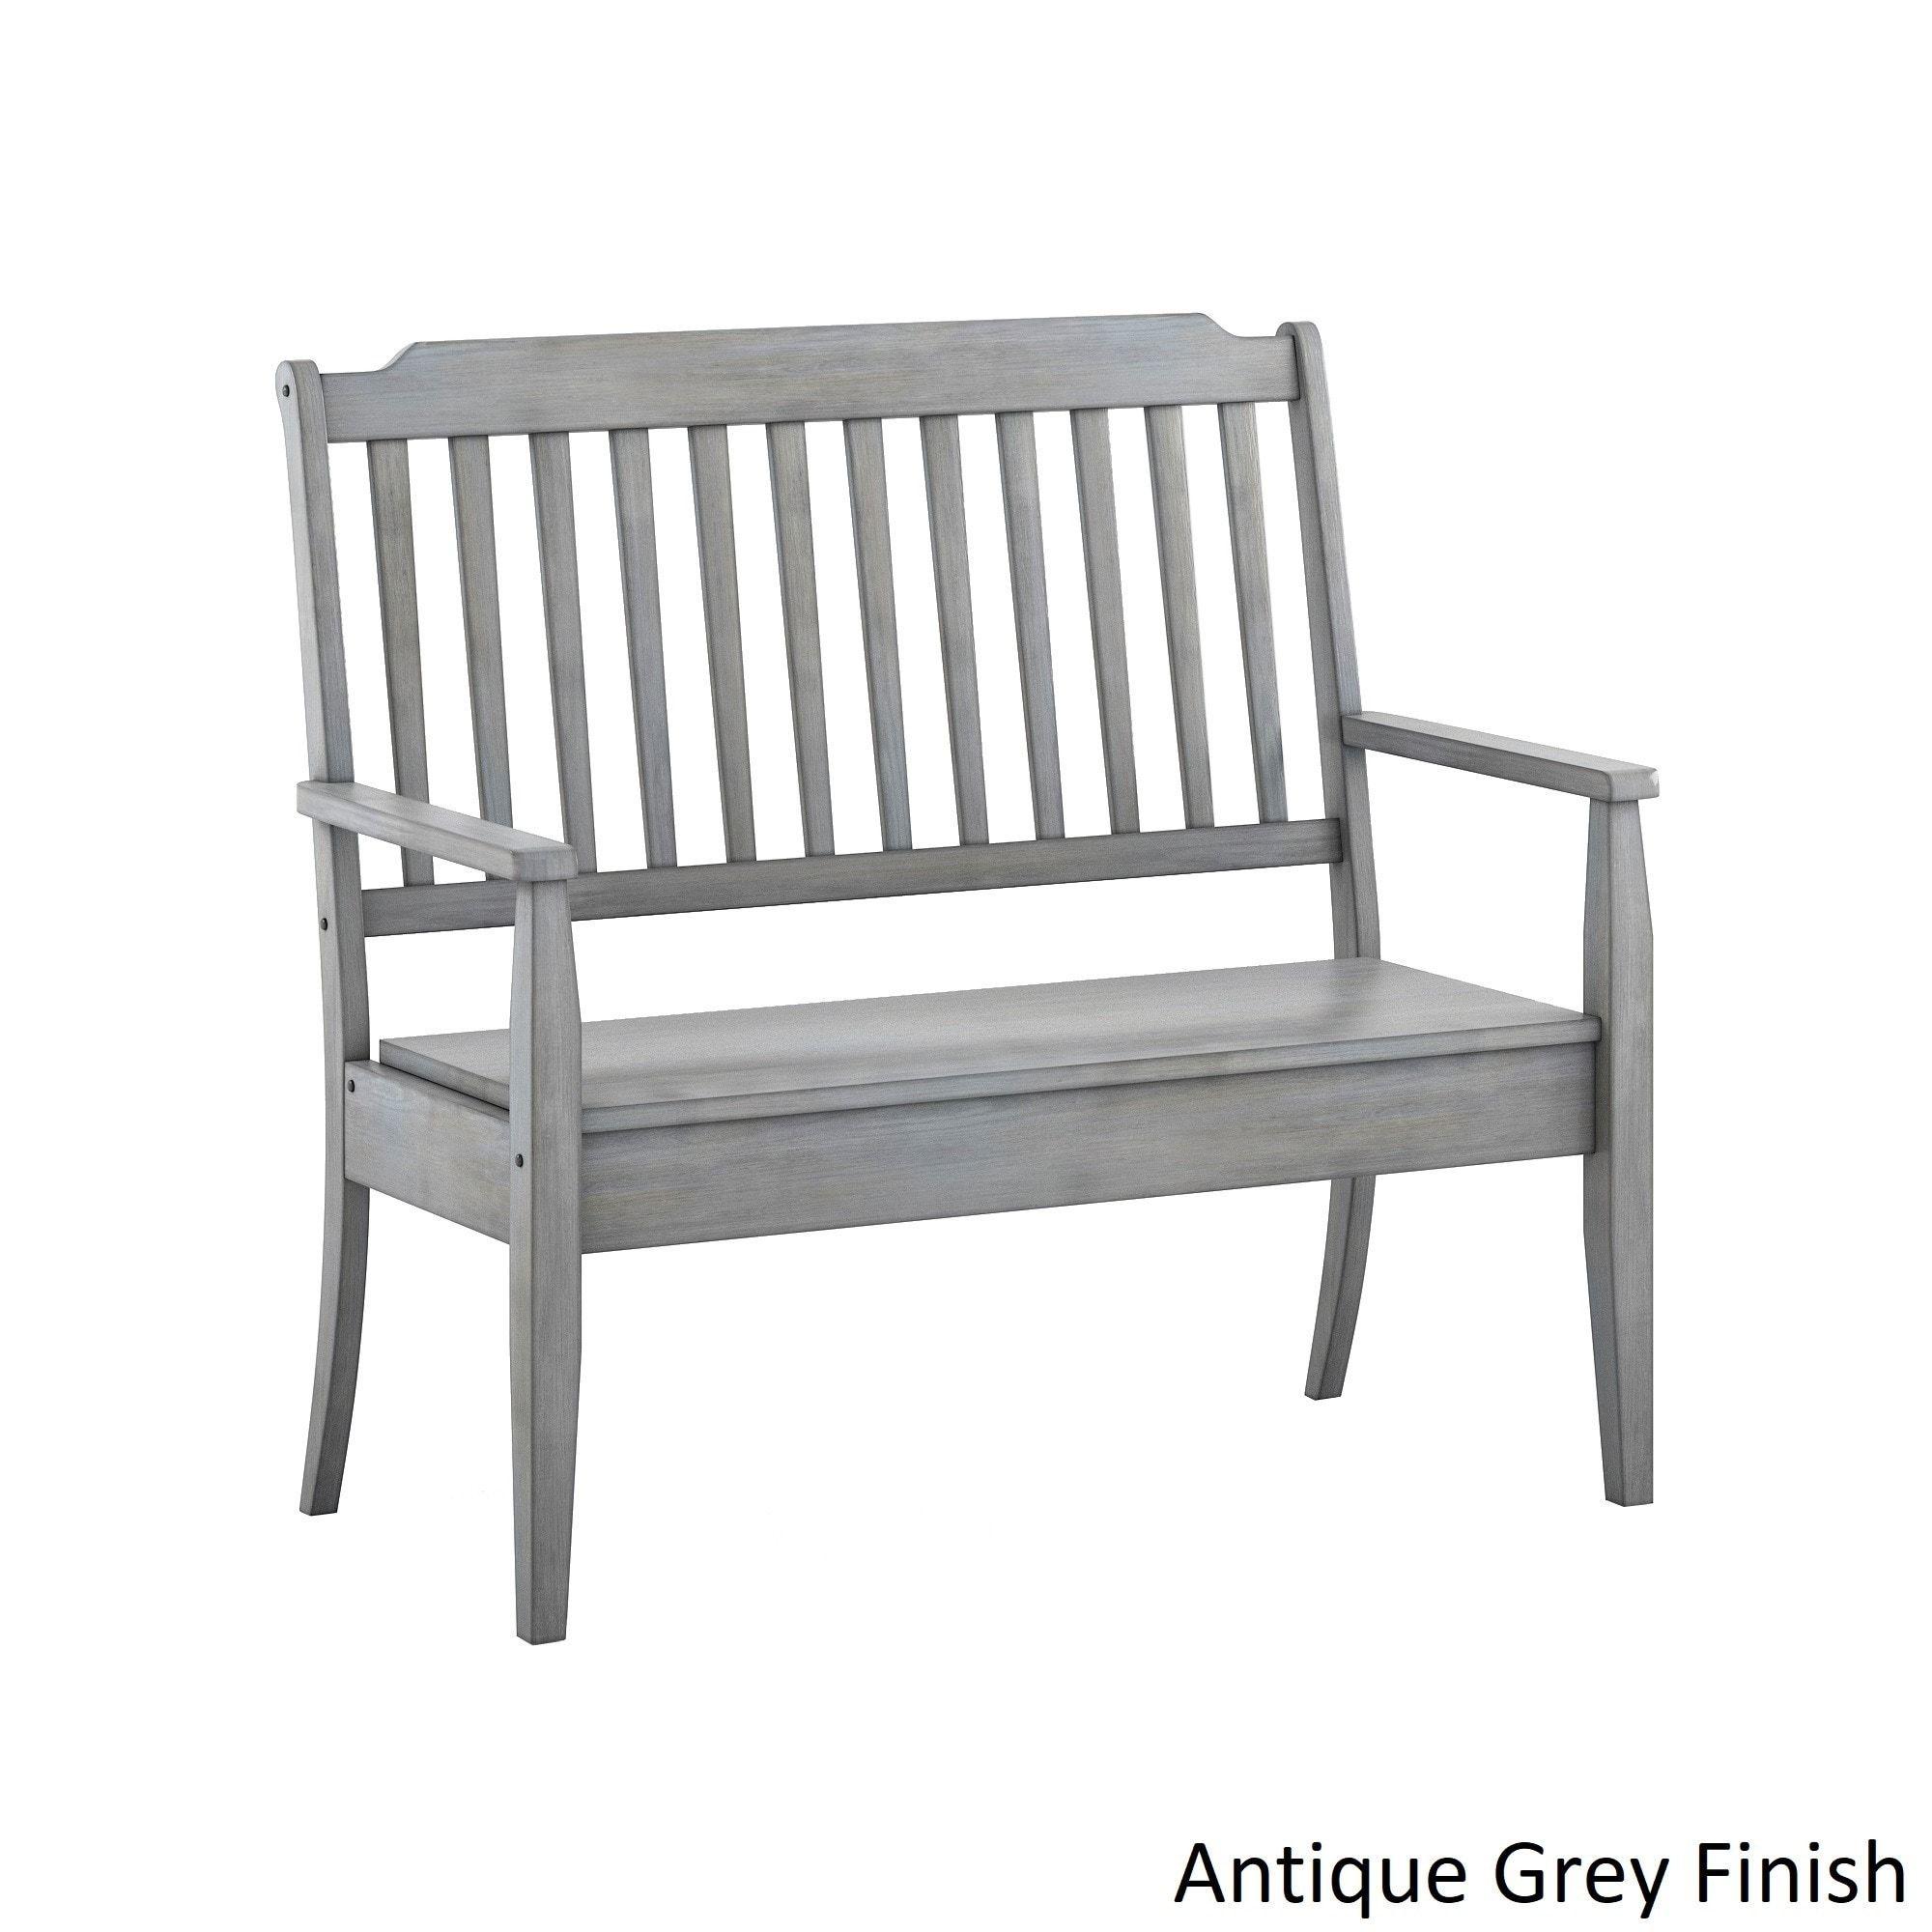 Eleanor slat back wood storage bench by inspire q classic antique grey finish bench rubberwood